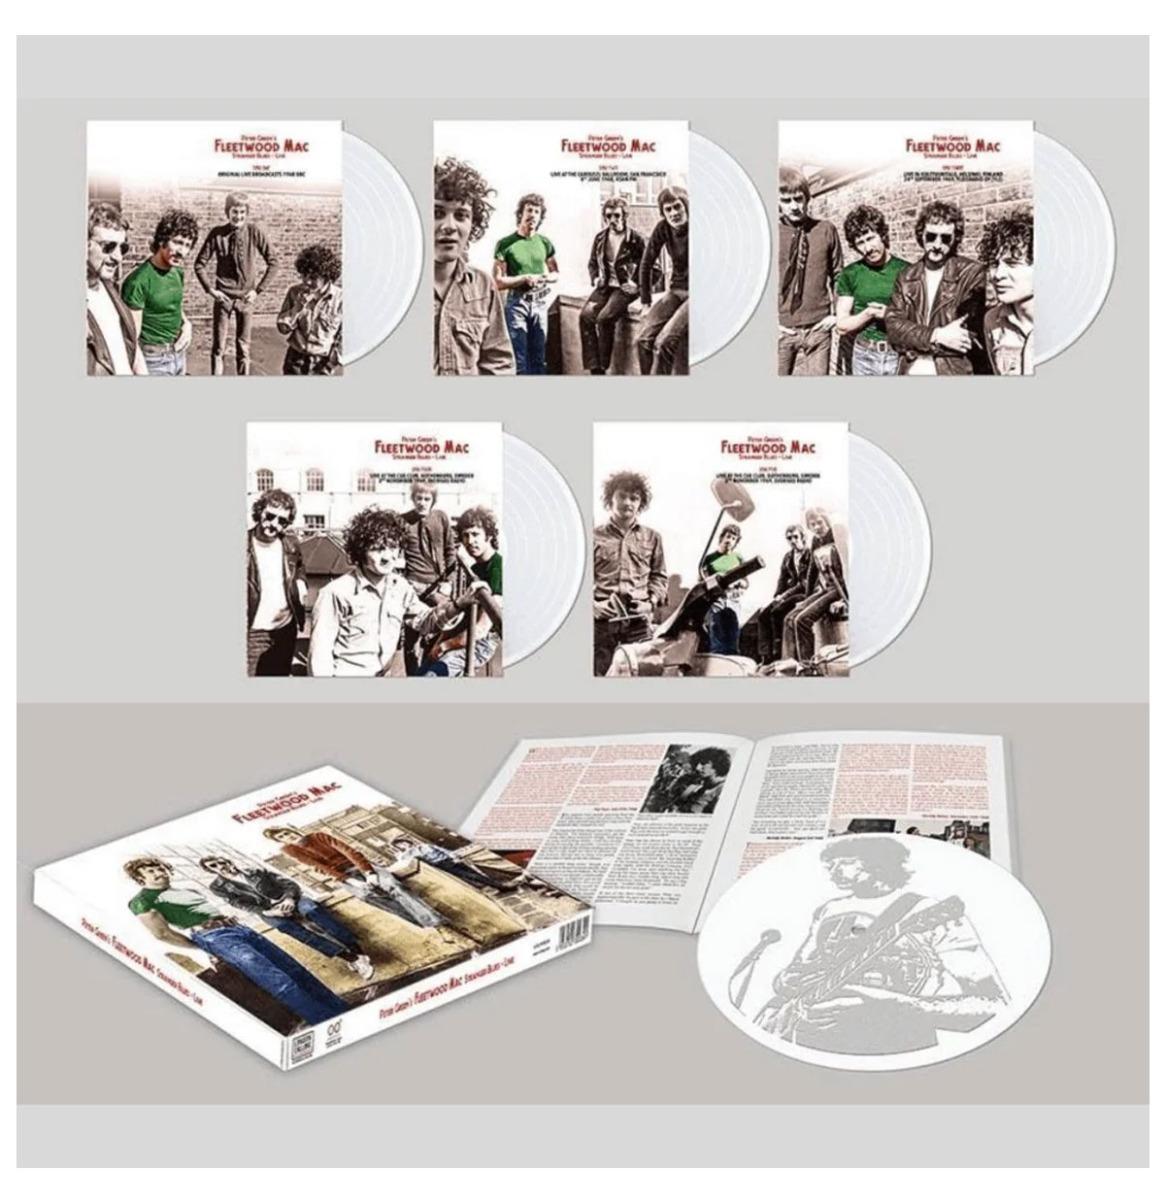 Peter Green's Fleetwood Mac - Stranger Blues Live 5-LP Box Limited Edition